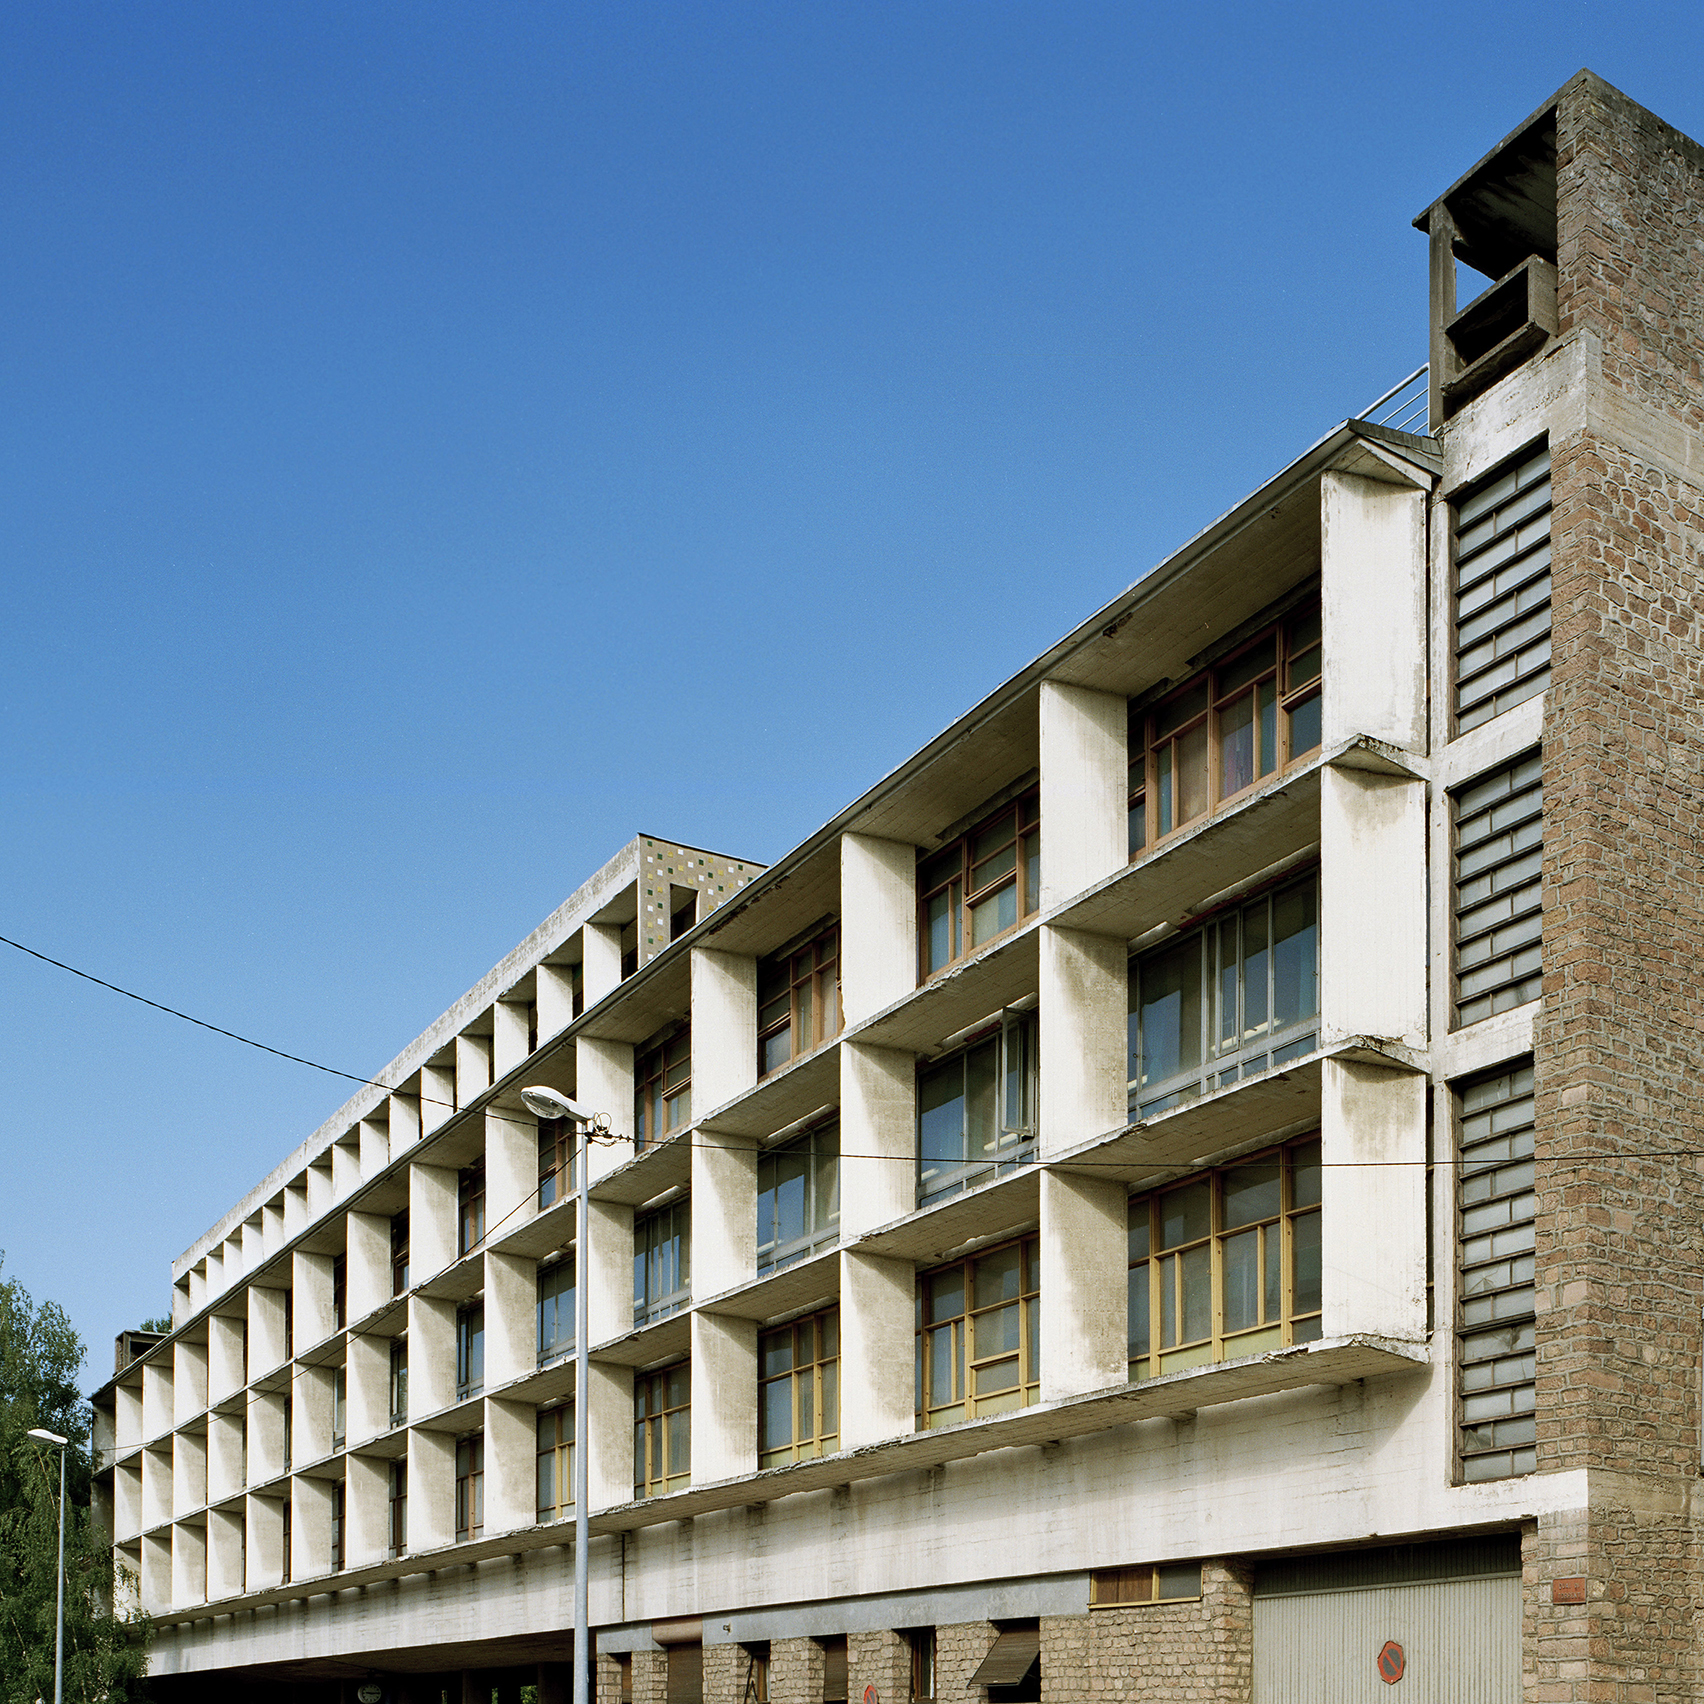 le corbusier 39 s claude et duval factory demonstrates his modulor proportion system archiweb 3 0. Black Bedroom Furniture Sets. Home Design Ideas